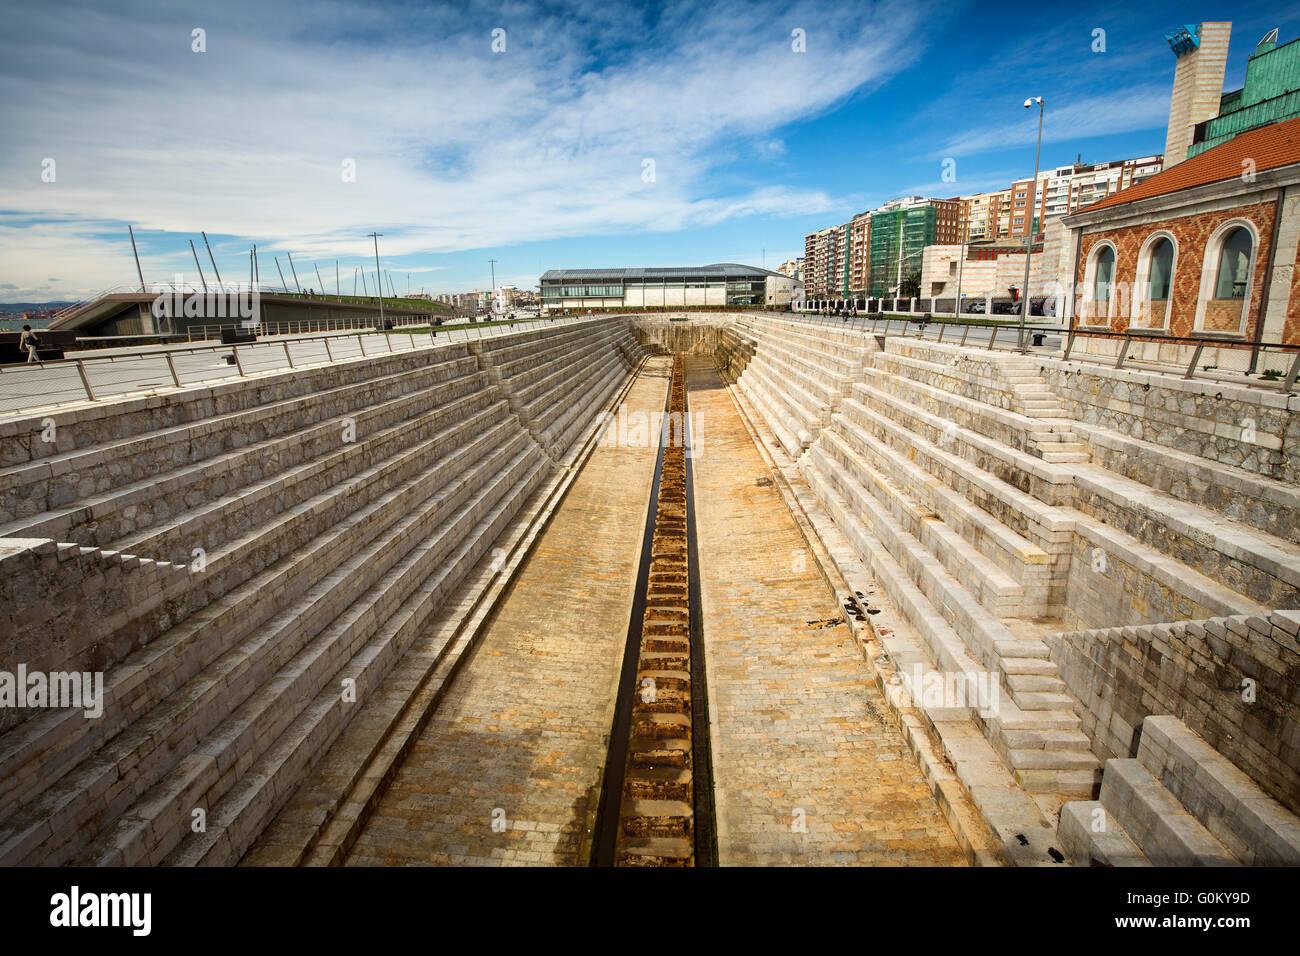 Dique de Gamazo dry dock. Santander Bay, Cantabria, Spain Europe - Stock Image